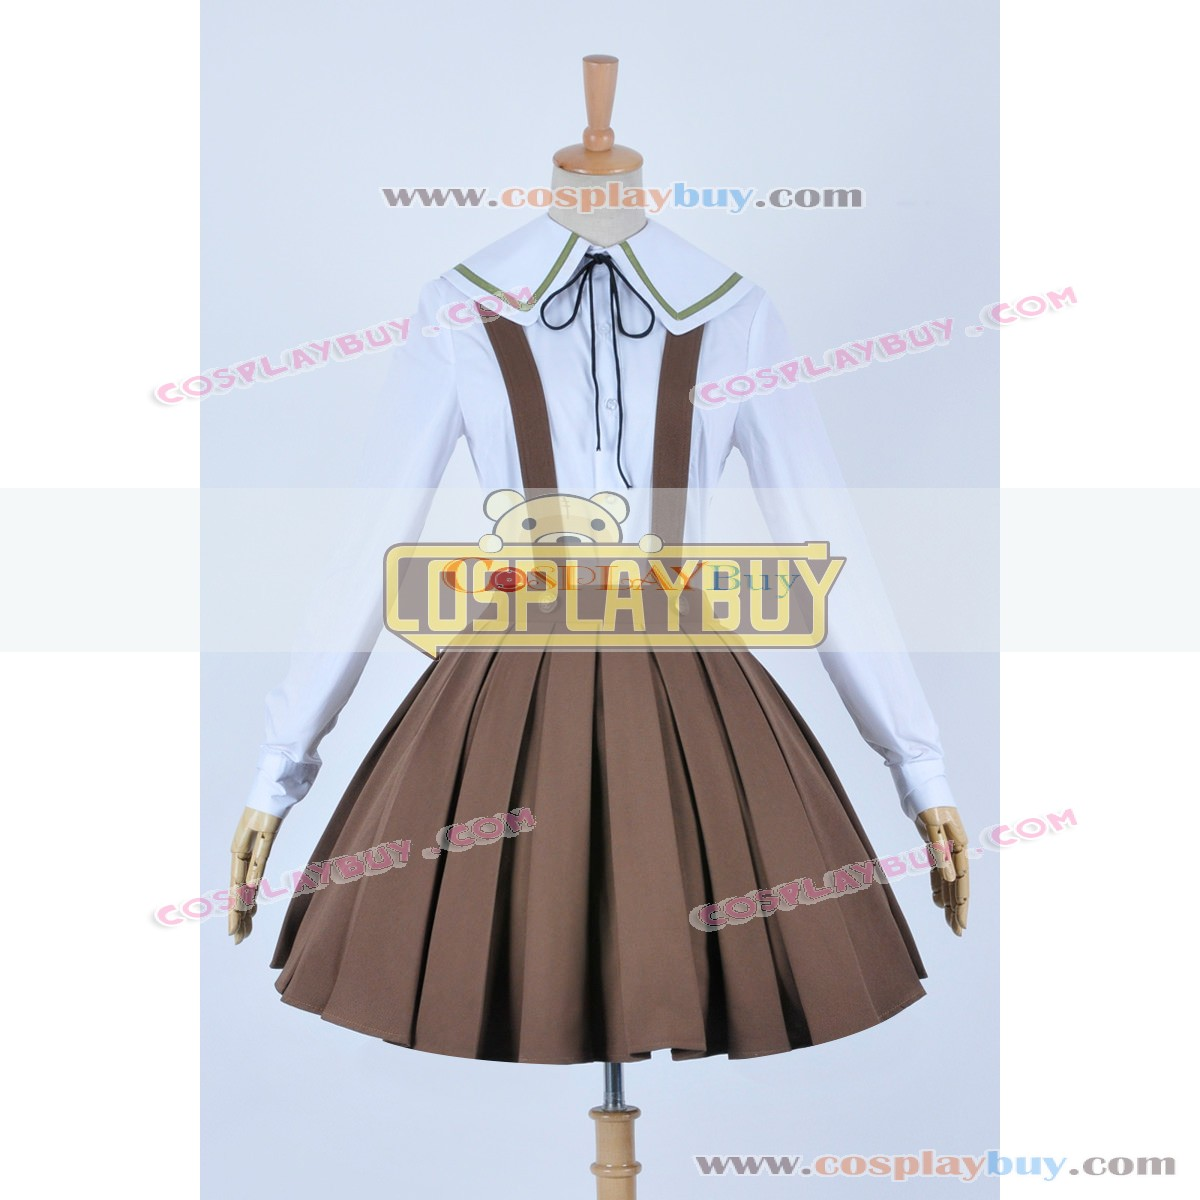 Danganronpa Dangan-Ronpa Chihiro Fujisaki Uniform Cosplay Costume Dress